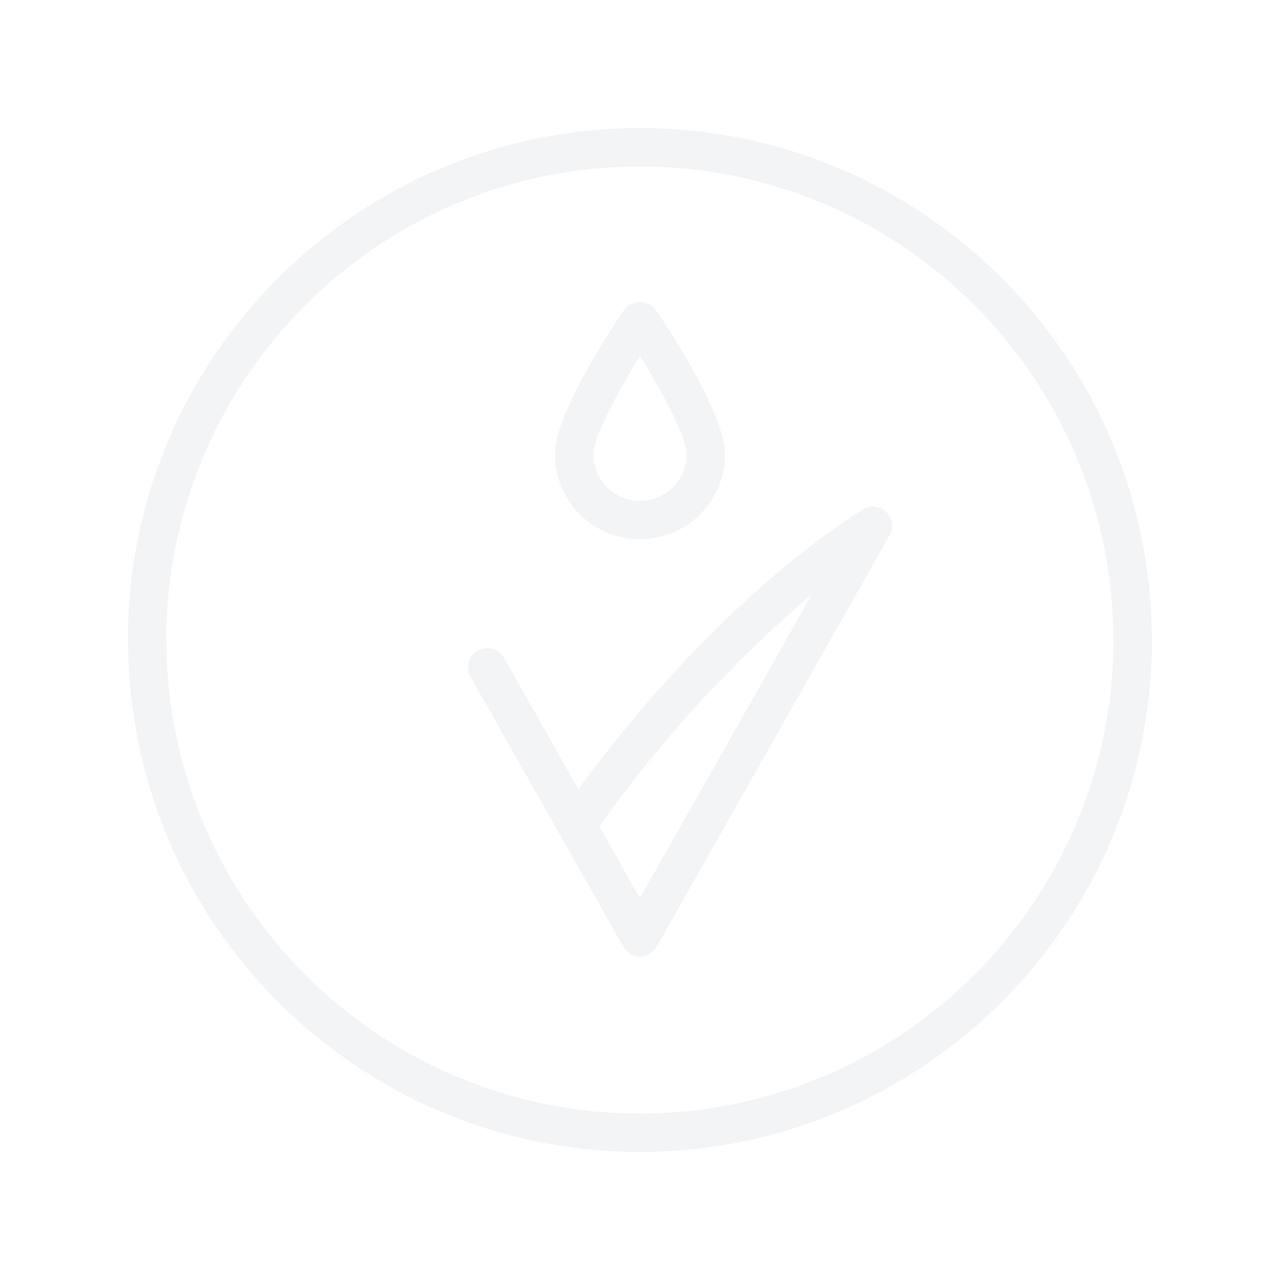 JANE IREDALE Eye Pencil 1.1g